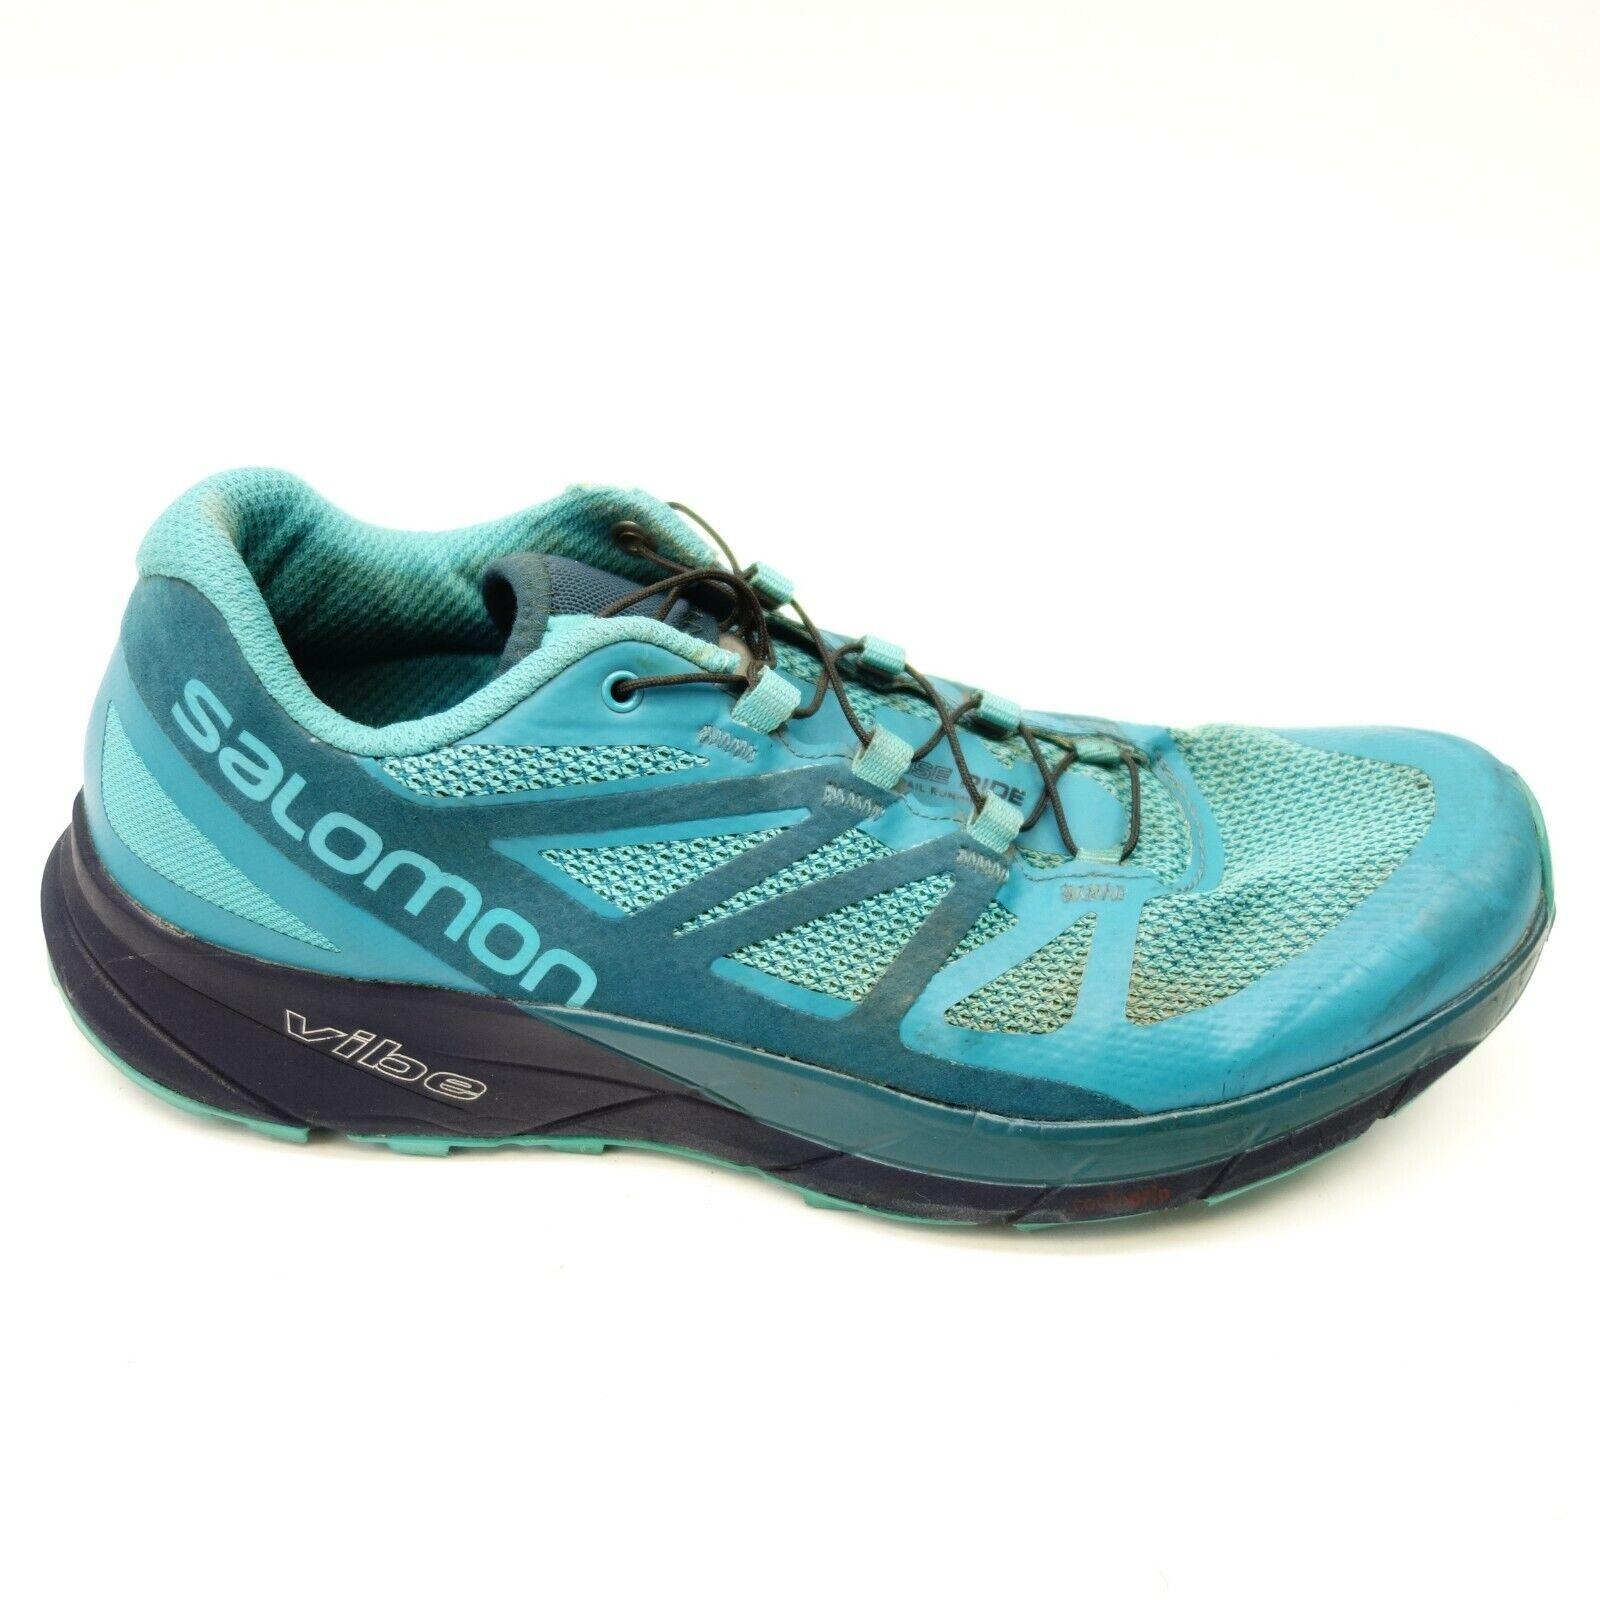 Salomon Sz 9 Sense Ride Ortholite bluee Athletic Hiking Running shoes Womens